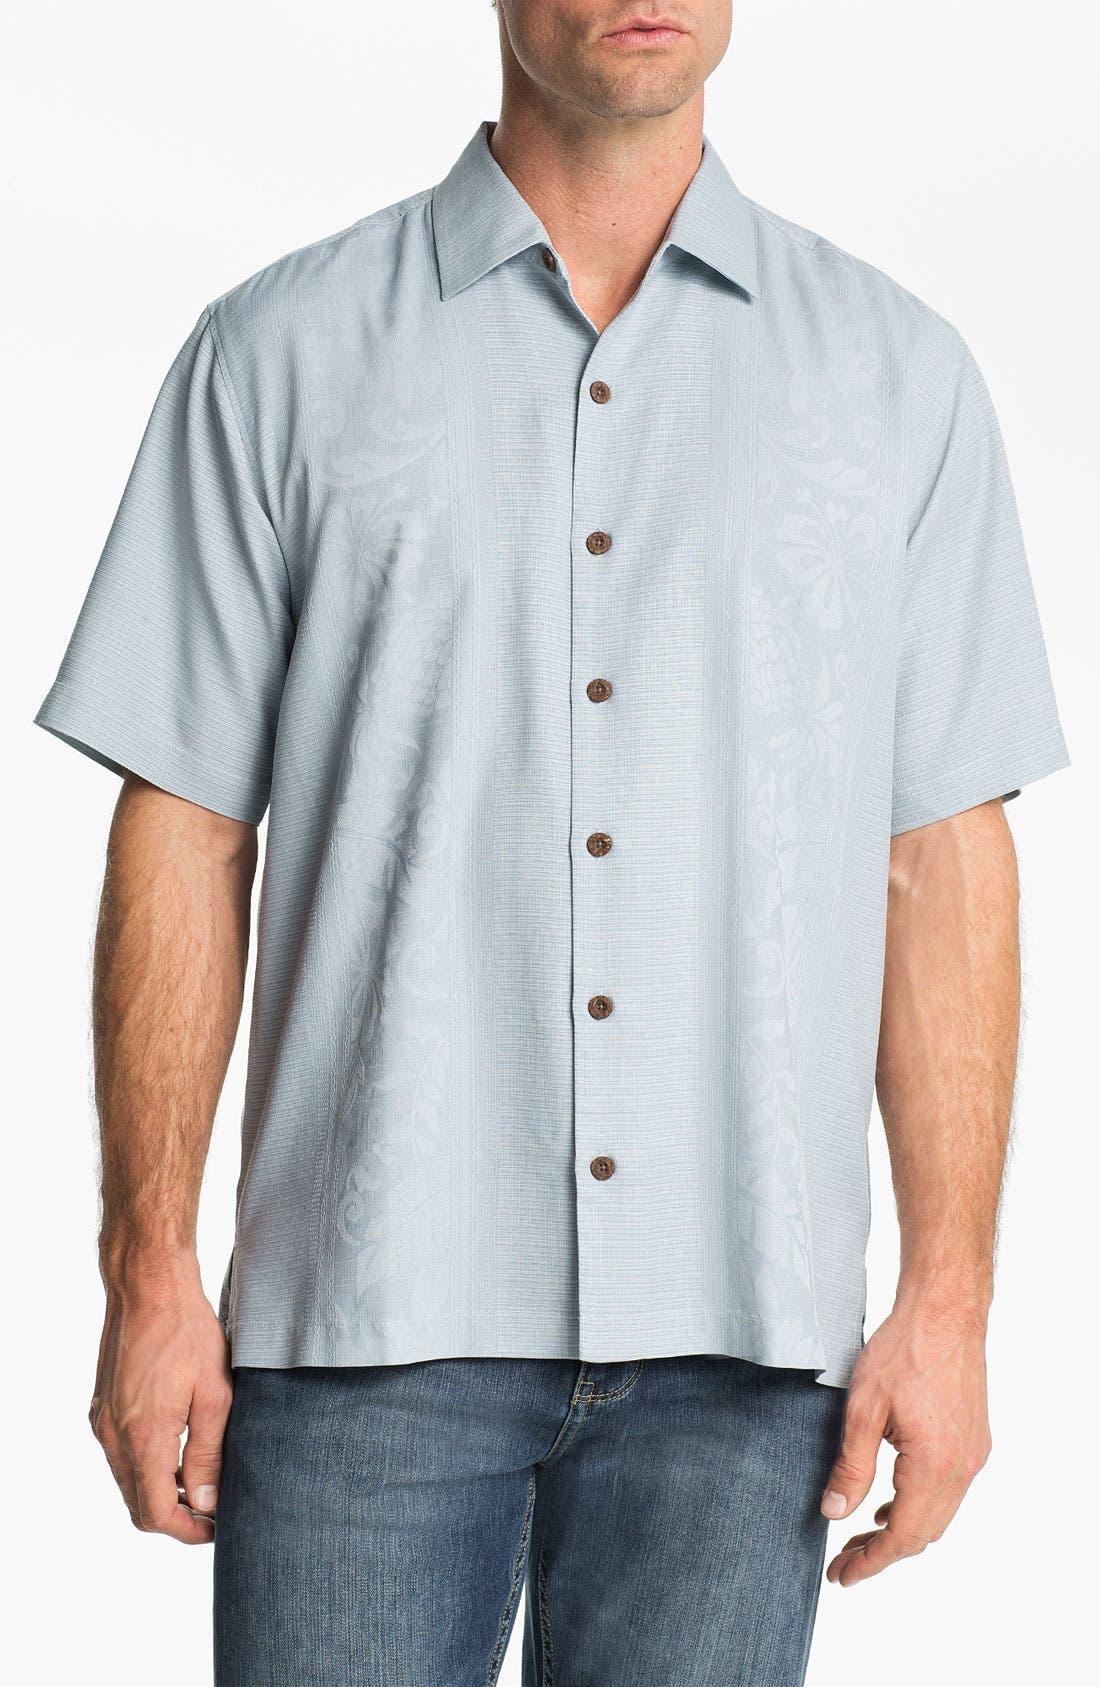 Alternate Image 1 Selected - Tommy Bahama 'Amazon' Original Fit Silk Jacquard Camp Shirt